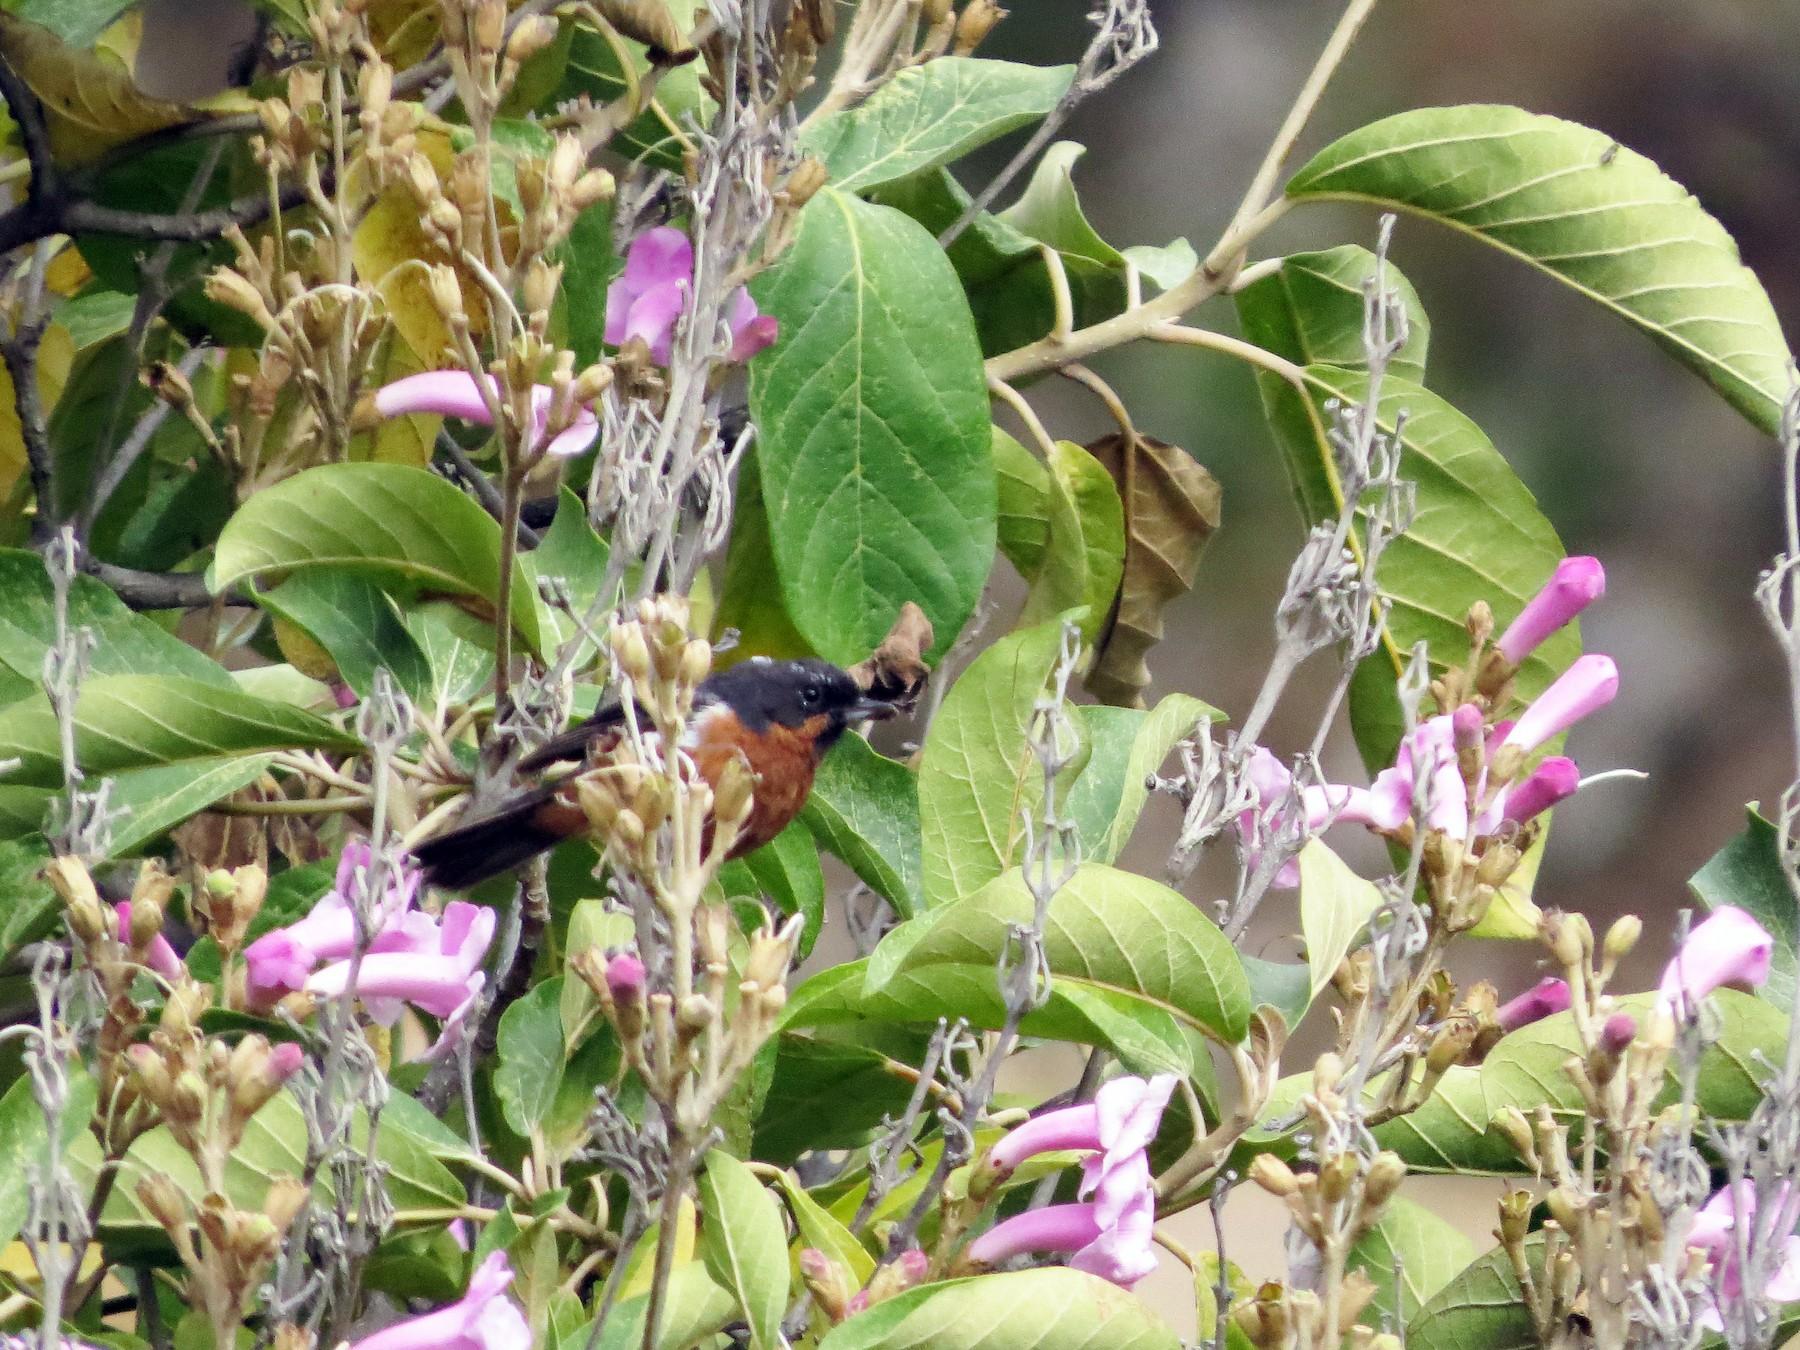 Black-throated Flowerpiercer - Manuel Roncal-Rabanal